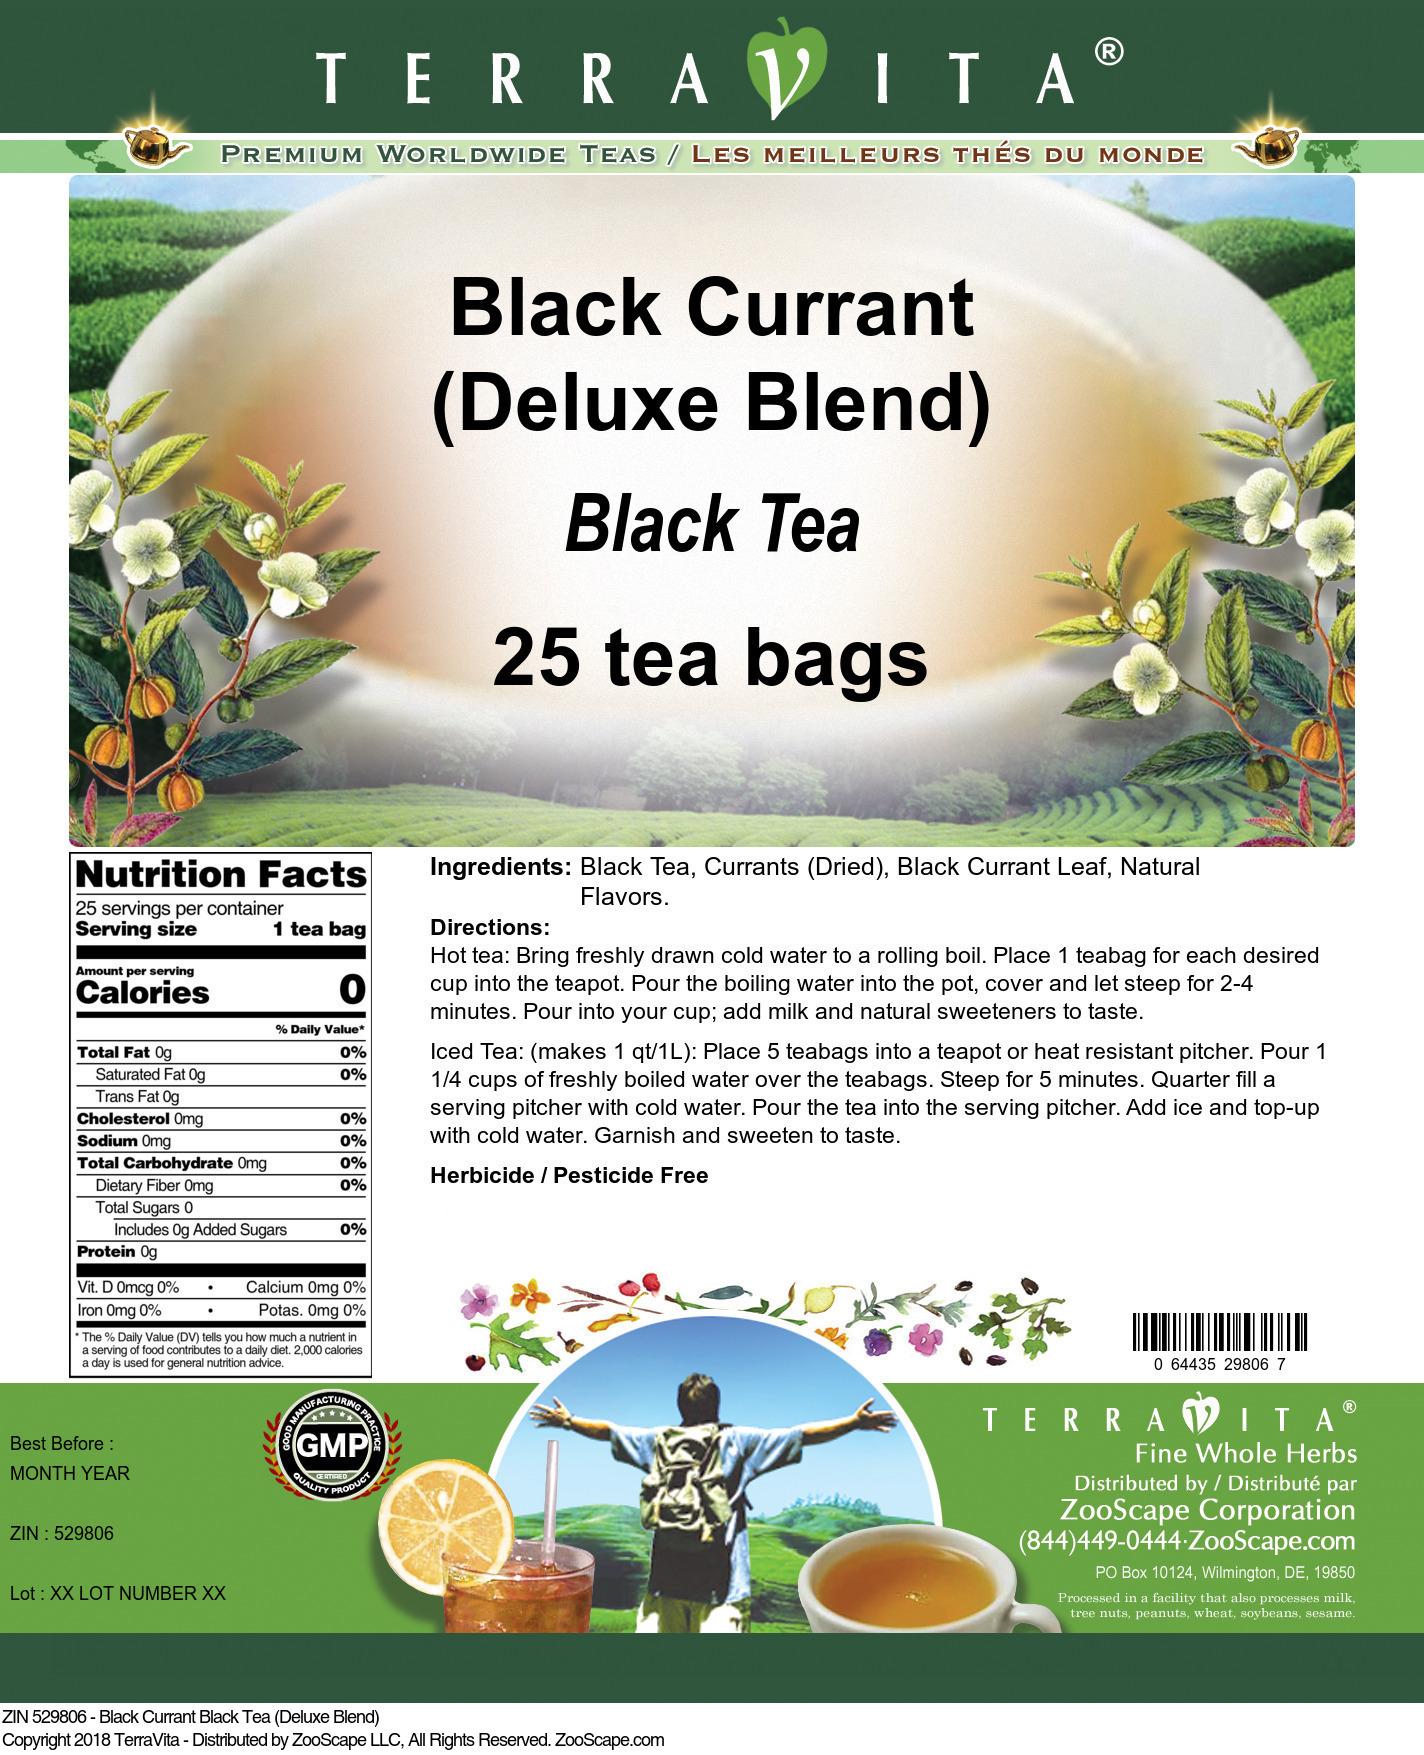 Black Currant Black Tea (Deluxe Blend)